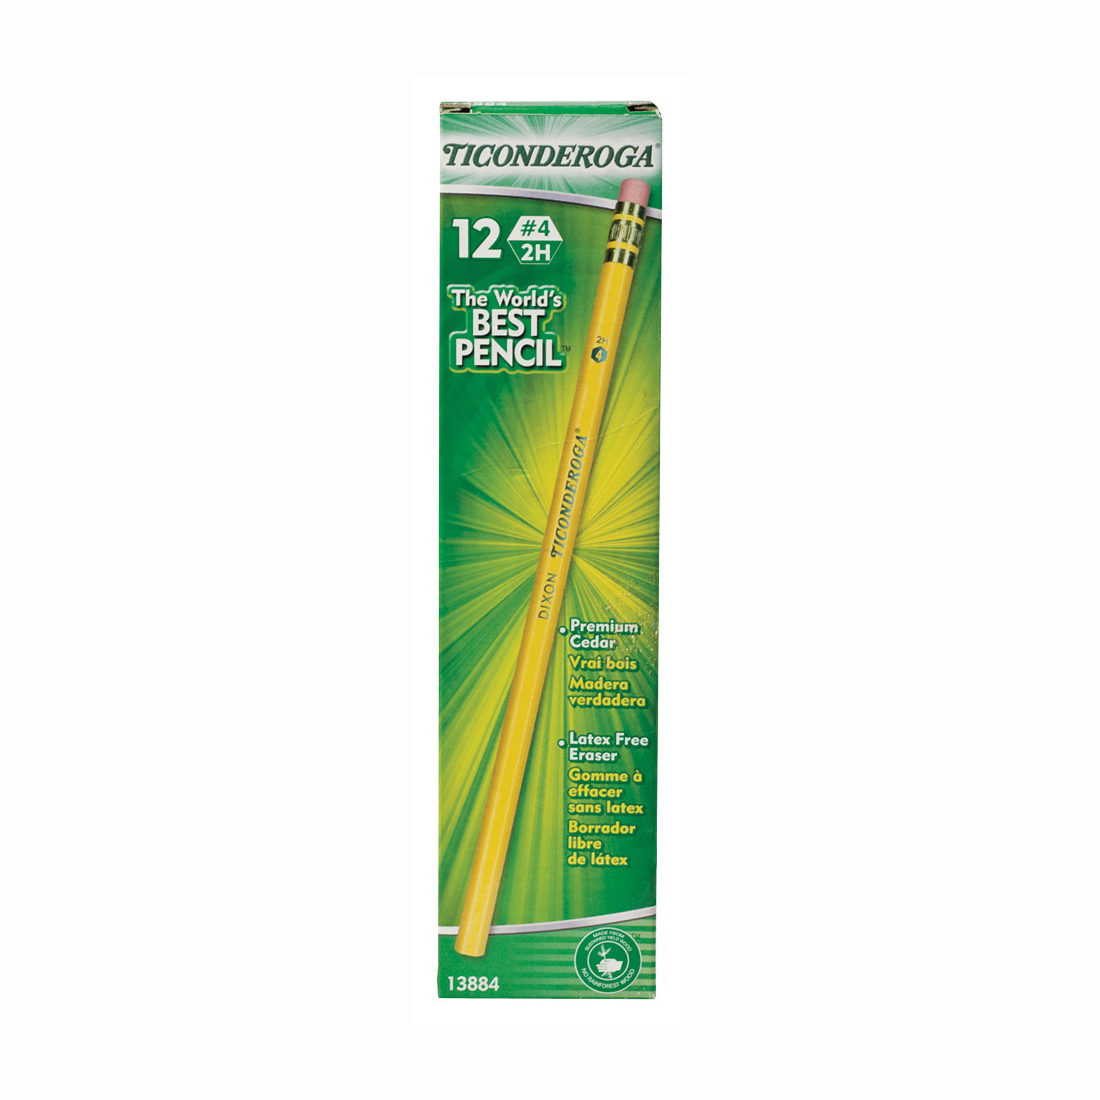 Picture of Ticonderoga 13884 Pencil, Extra Hard Lead, Wood Barrel